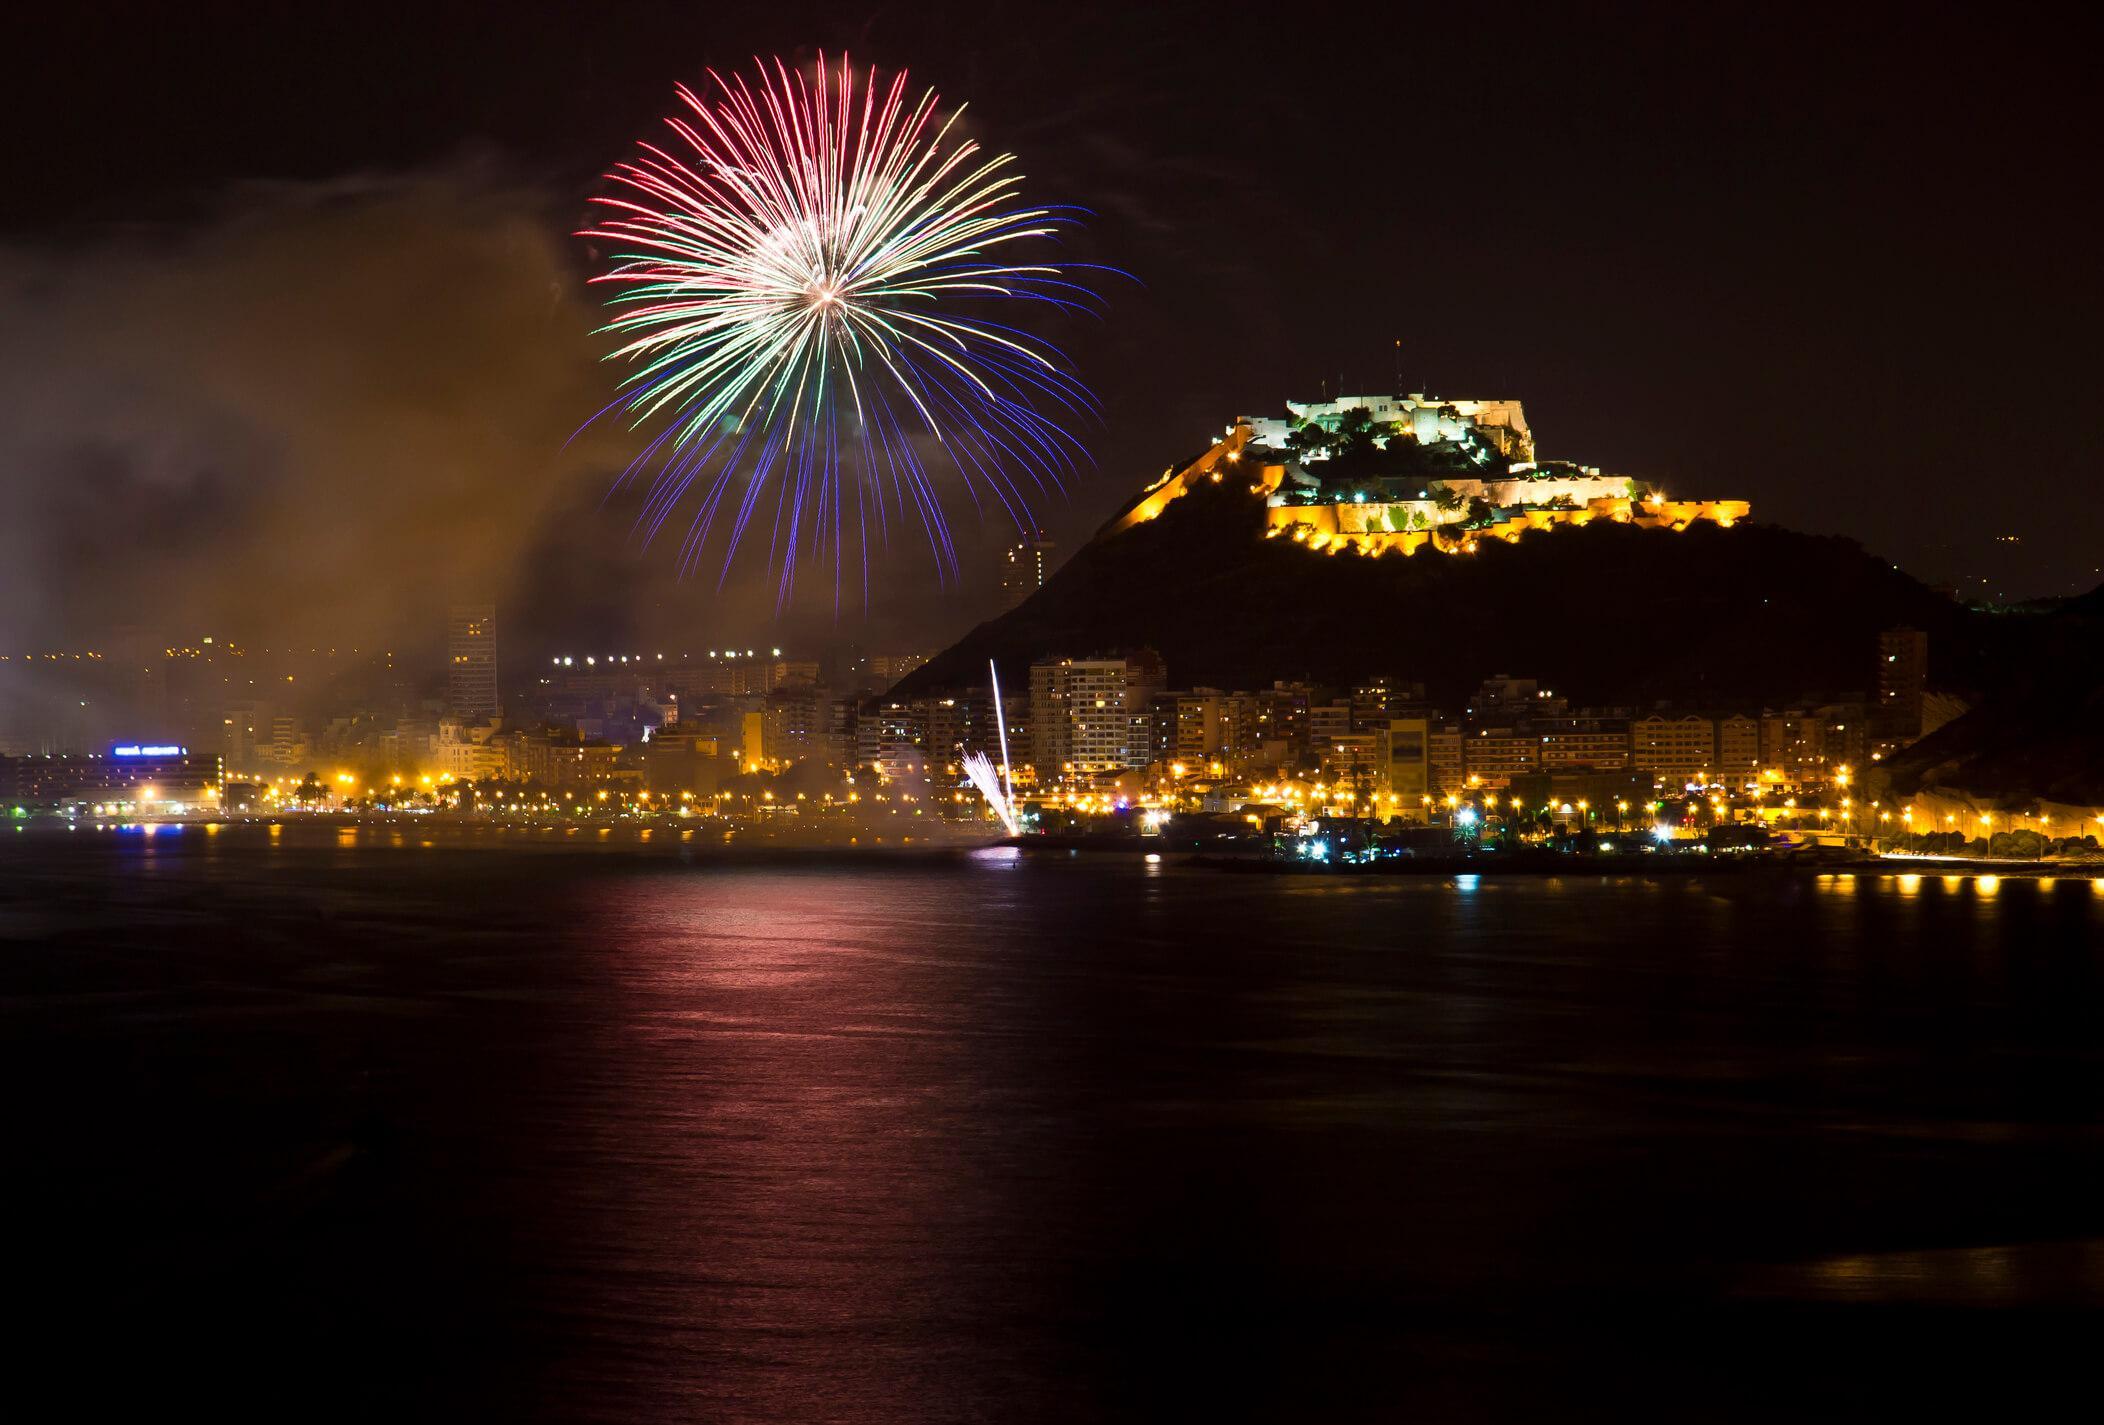 Hogueras de Alicante Fiesta de San Juan